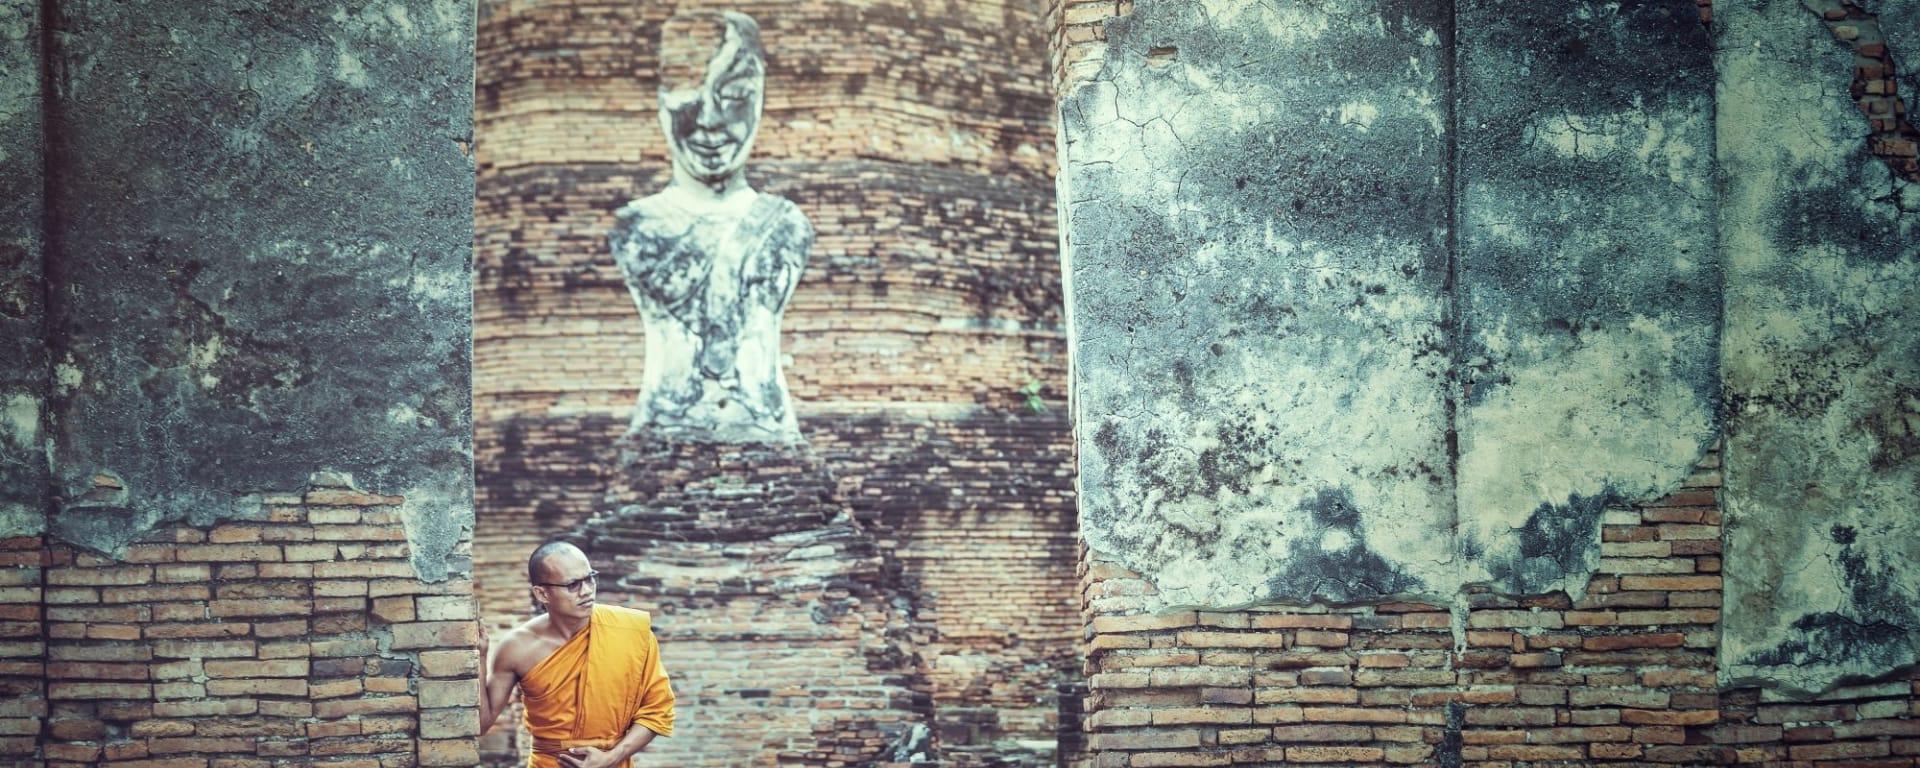 Höhepunkte Thailands ab Bangkok: Ayutthaya Historial Park with Monk